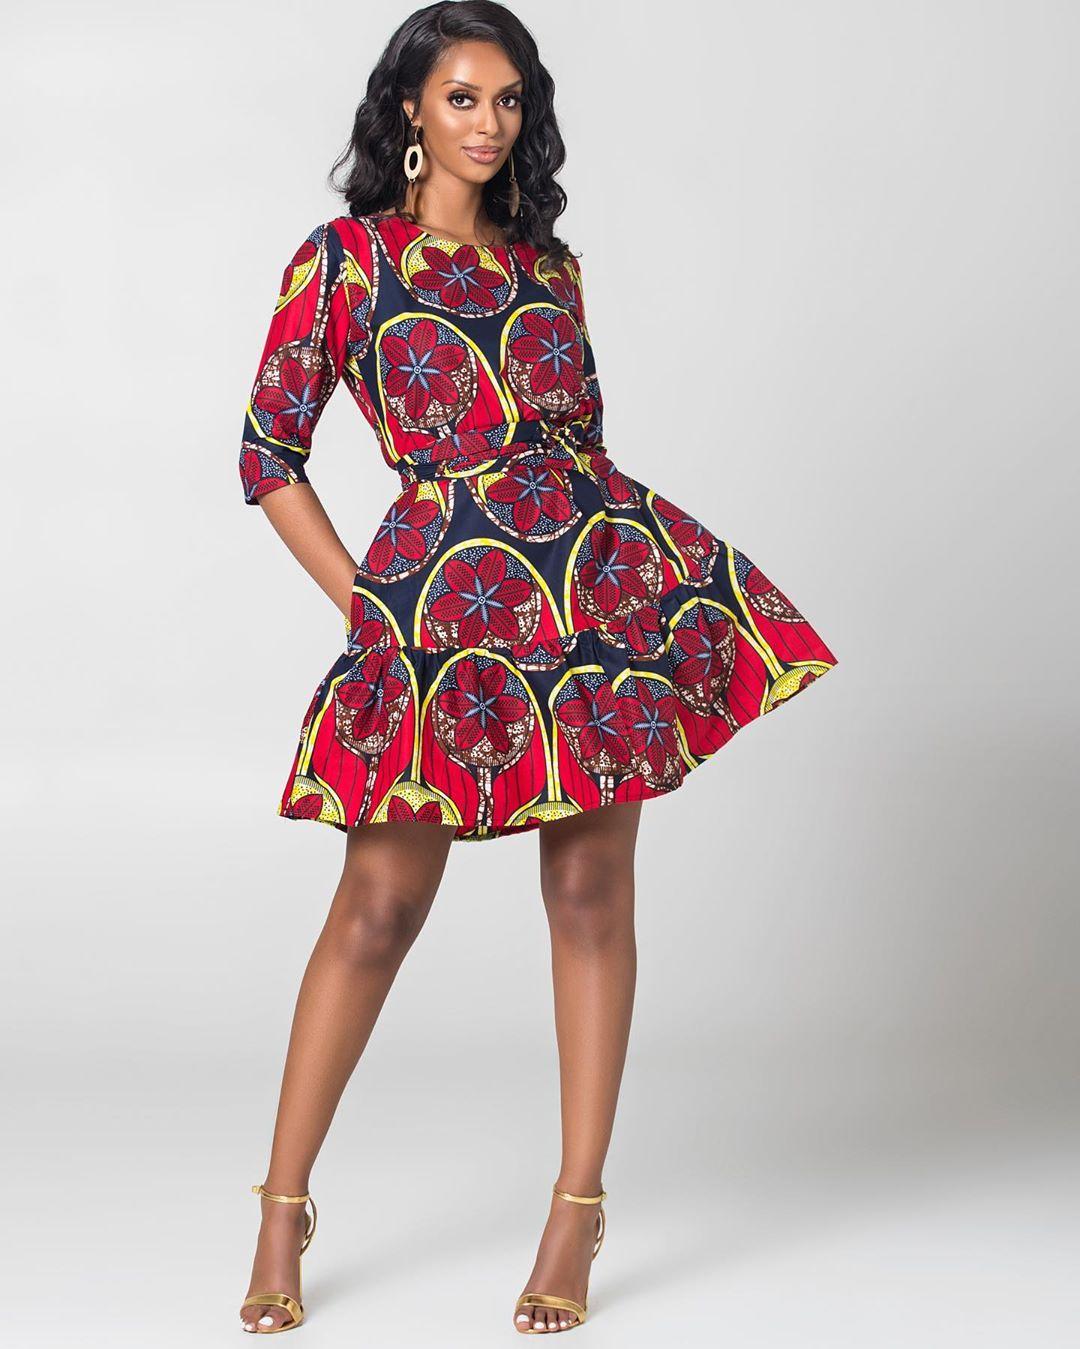 short ankara gown styles ideas the theresa dress